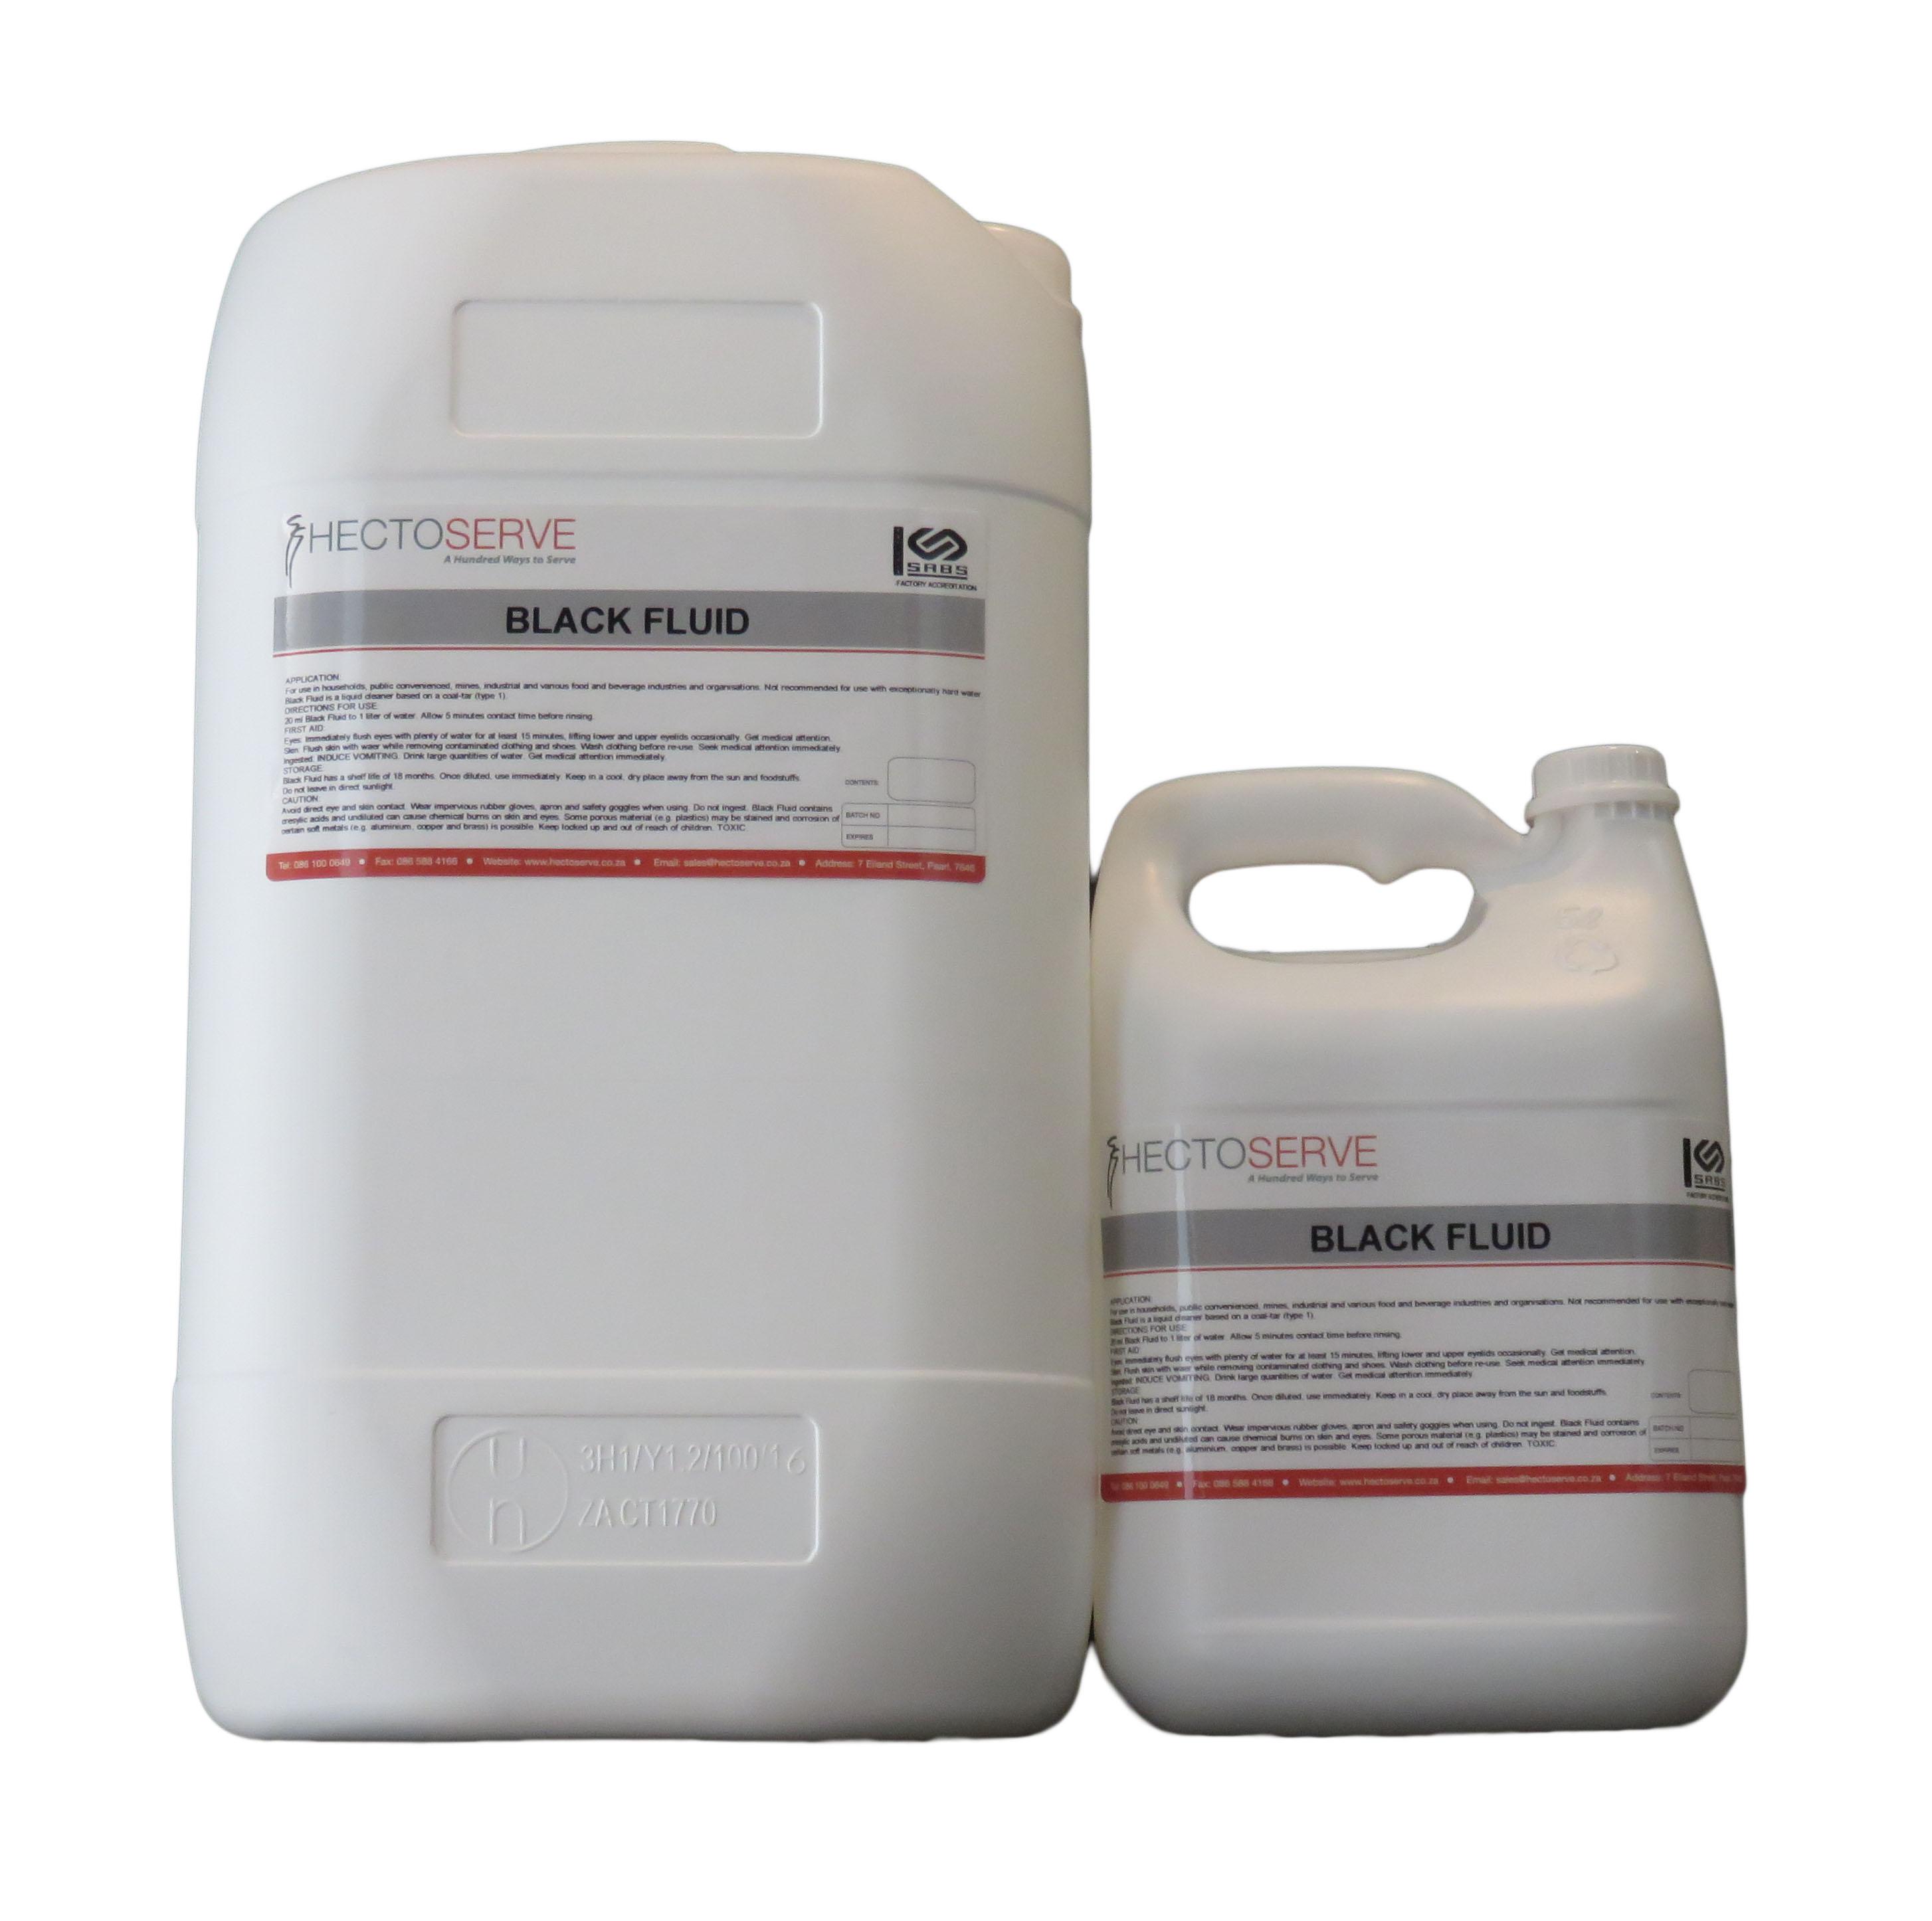 Hectoserve Black Fluid Disinfectant